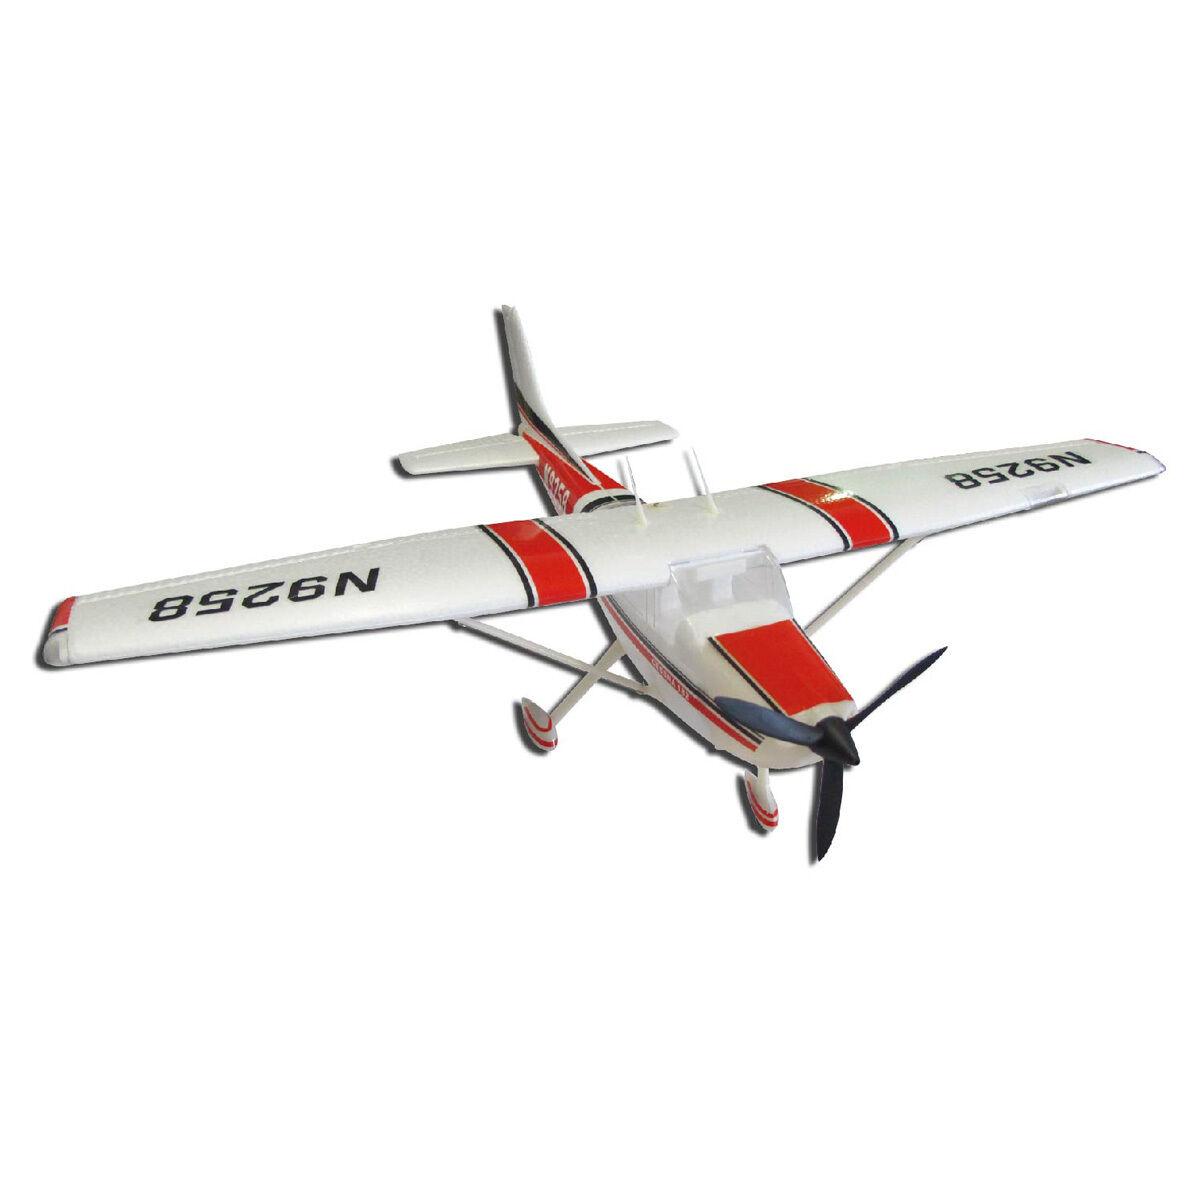 FLYFLY HOBBY-Cessna 182 PNP Electric Plane [ff-f001-pnp] - GALAXY RC